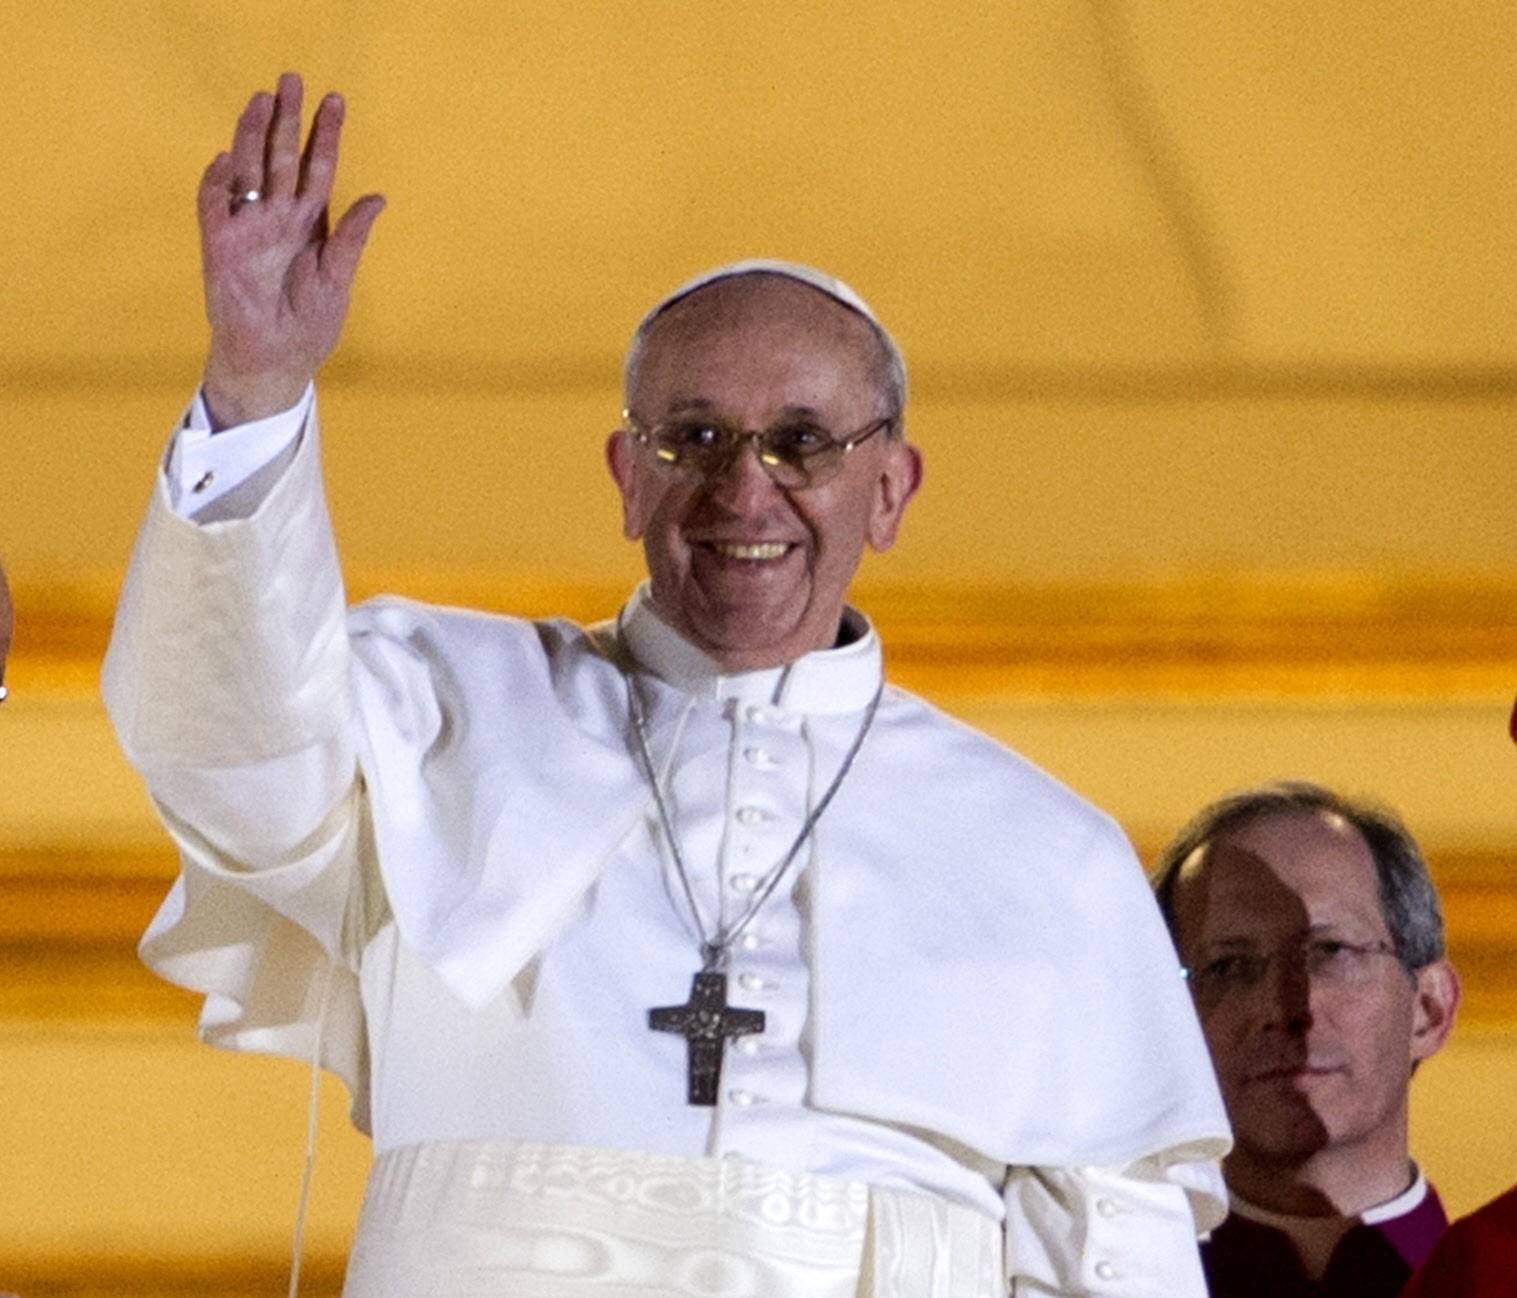 Apparition du pape FRANCOIS, card. Jorge Mario BERGOGLIO